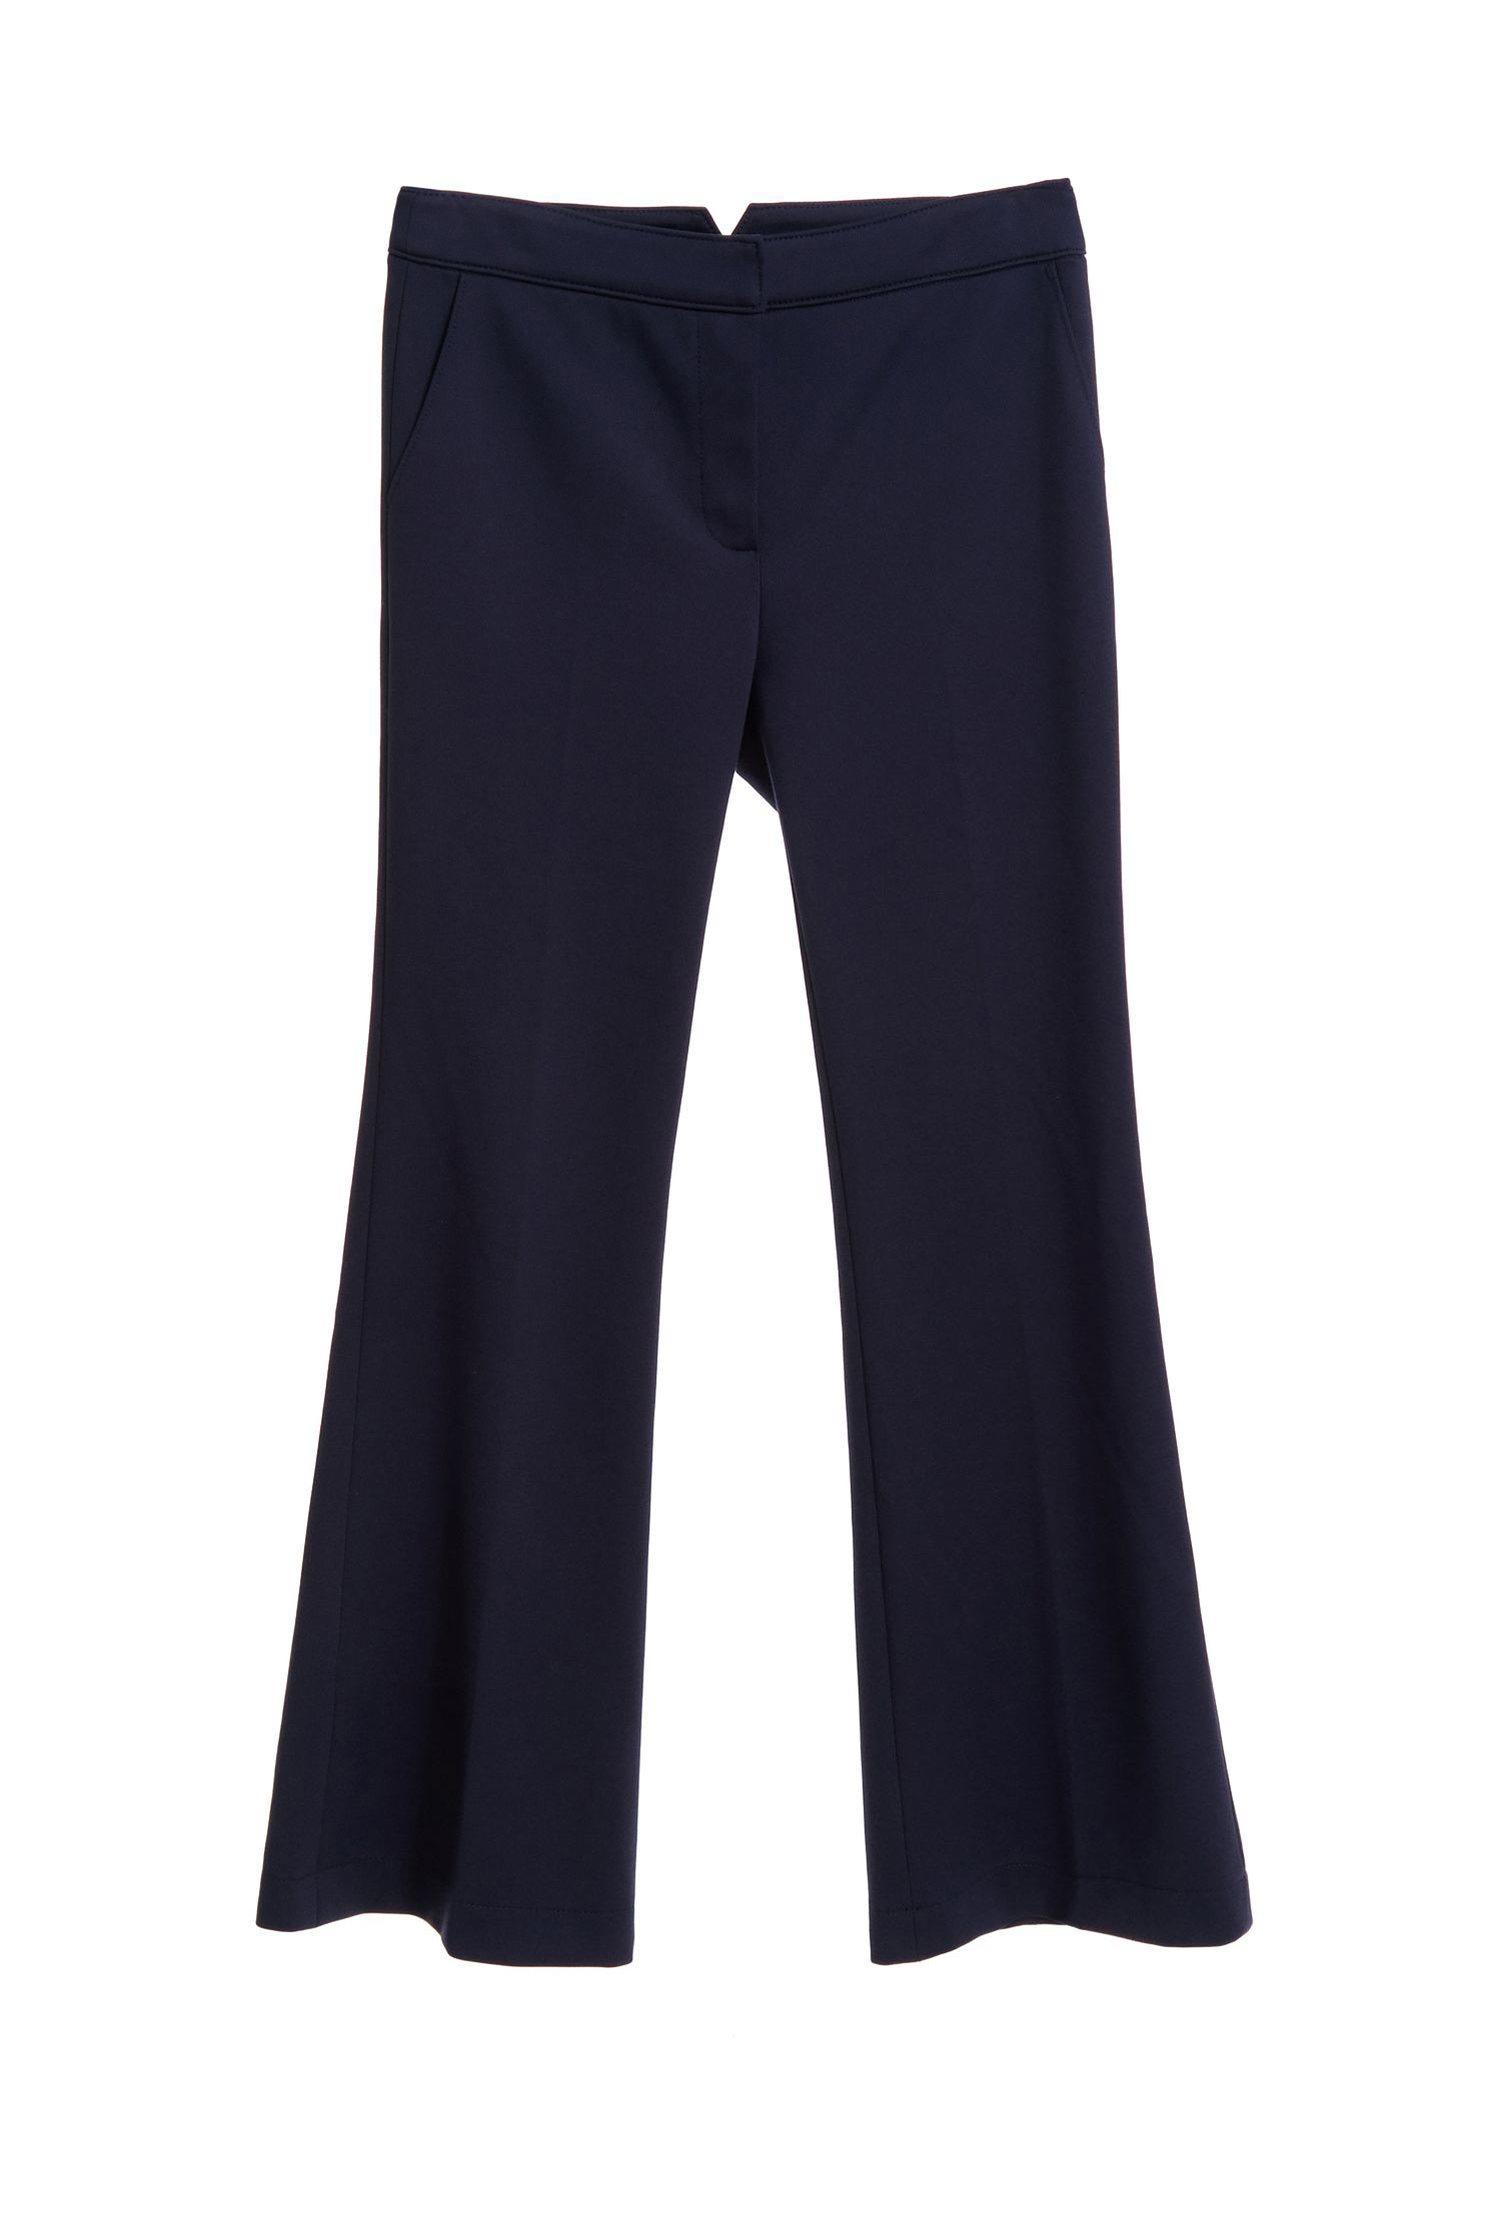 Navy blue twill pants,Bell Bottom Jeans,Pants,長褲,Thin pants